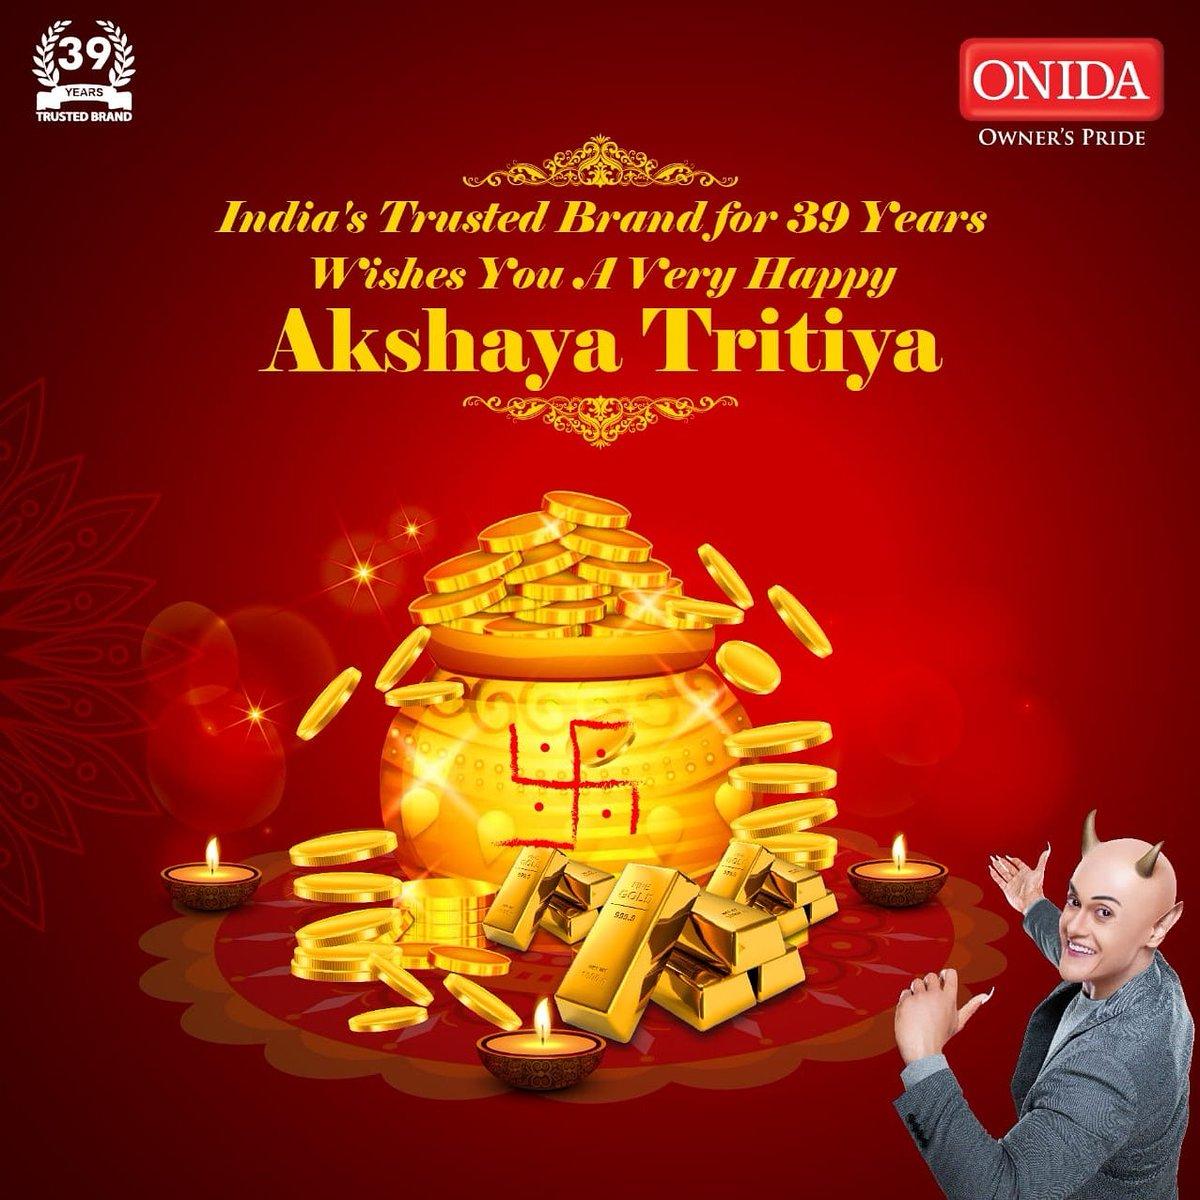 May this Akshaya Tritiya, light up for you. The hopes of happy times and dreams for a year full of smiles! Wishing you a very Happy Akshaya Tritiya. #HappyAkshayaTritiya https://t.co/oB6JqngzMA